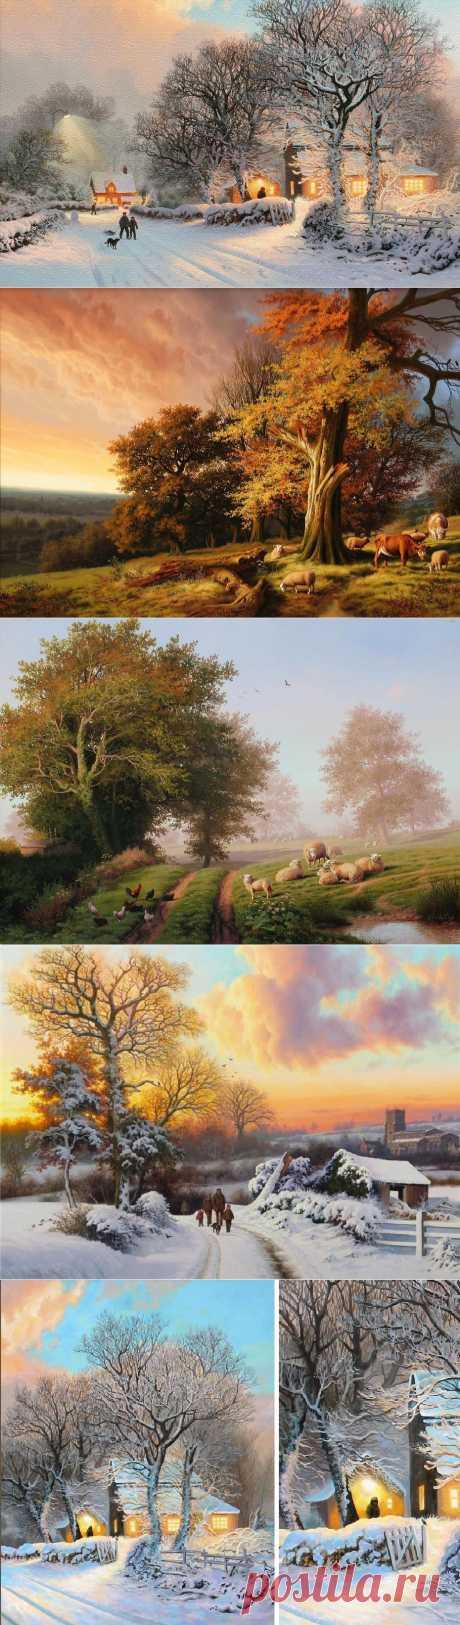 Творчество художника Daniel van der Putten.